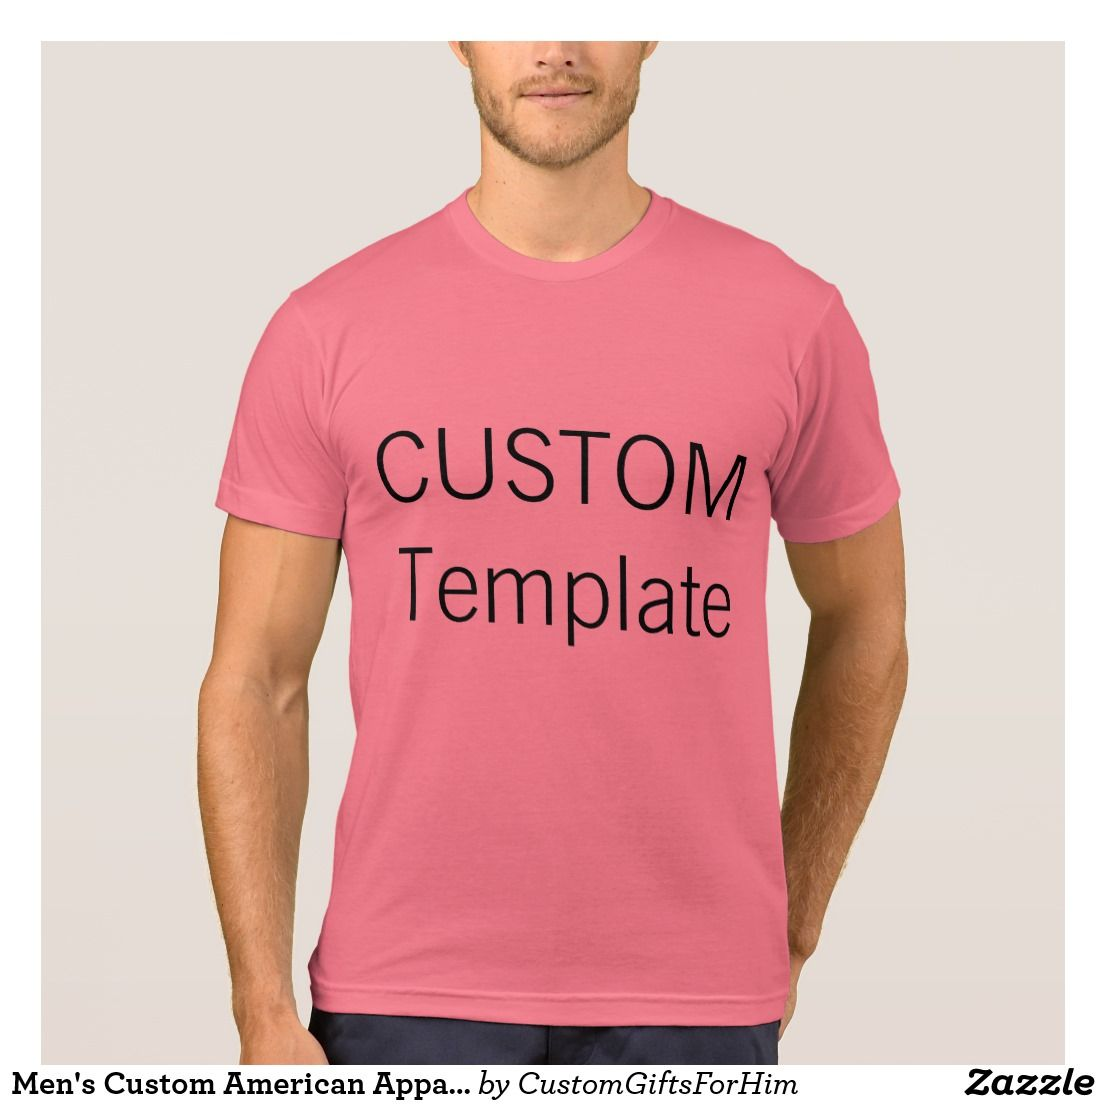 Zazzle t shirt design template - Men S Custom American Apparel T Shirt Neon Pink